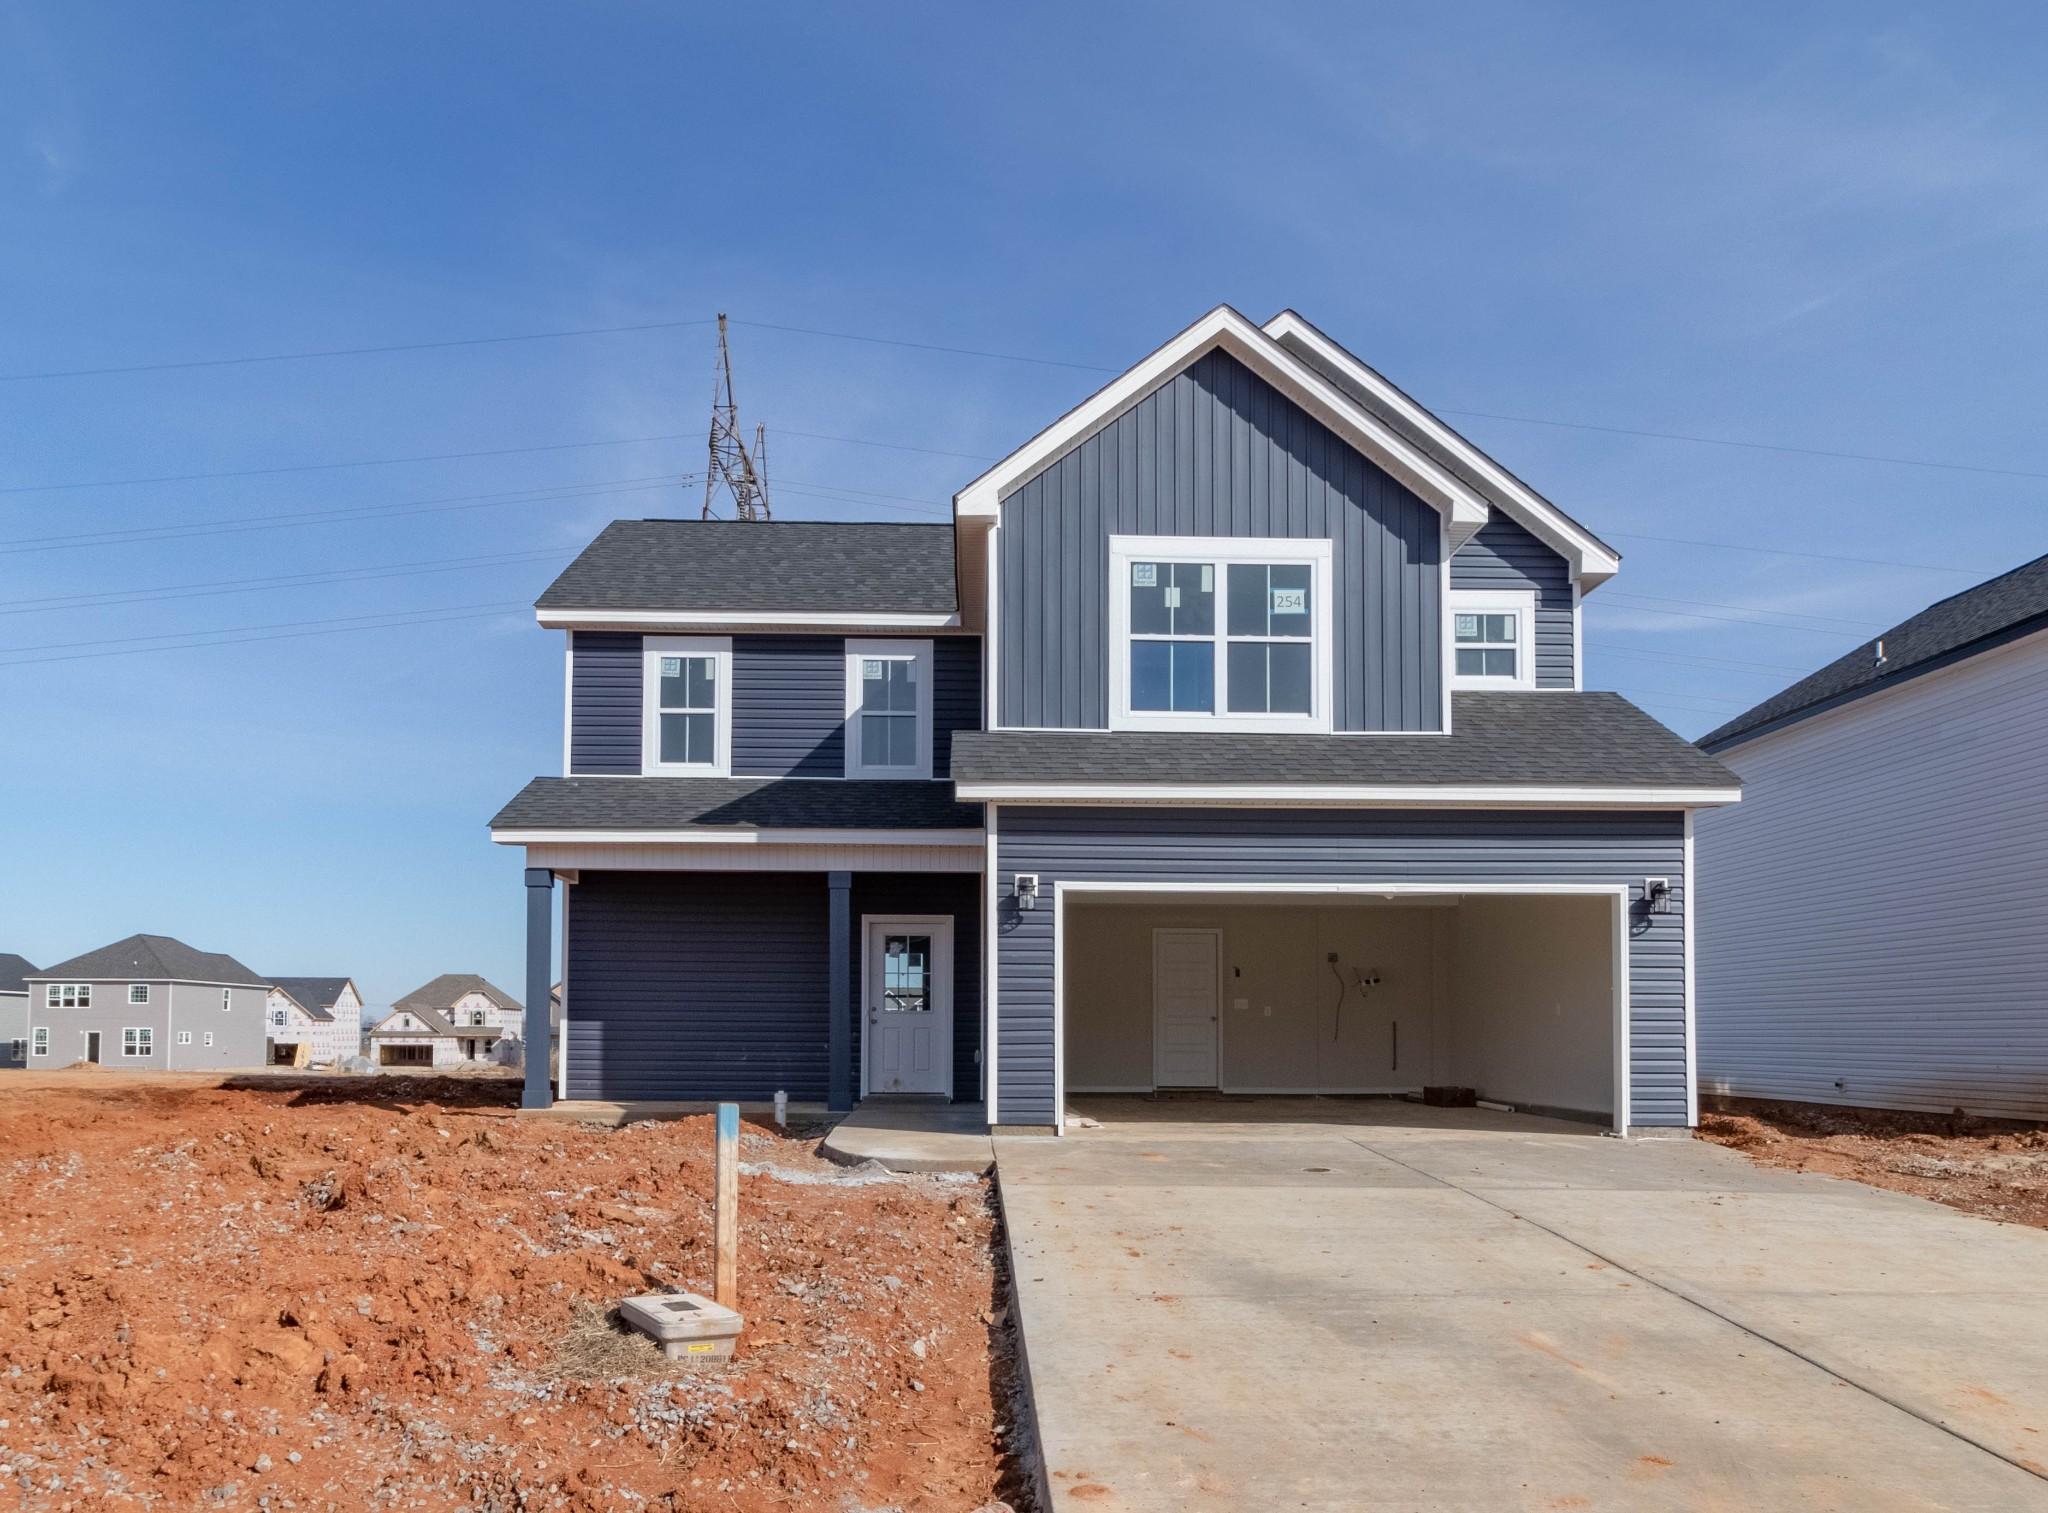 254 White Tail Ridge, Clarksville, TN 37040 - Clarksville, TN real estate listing